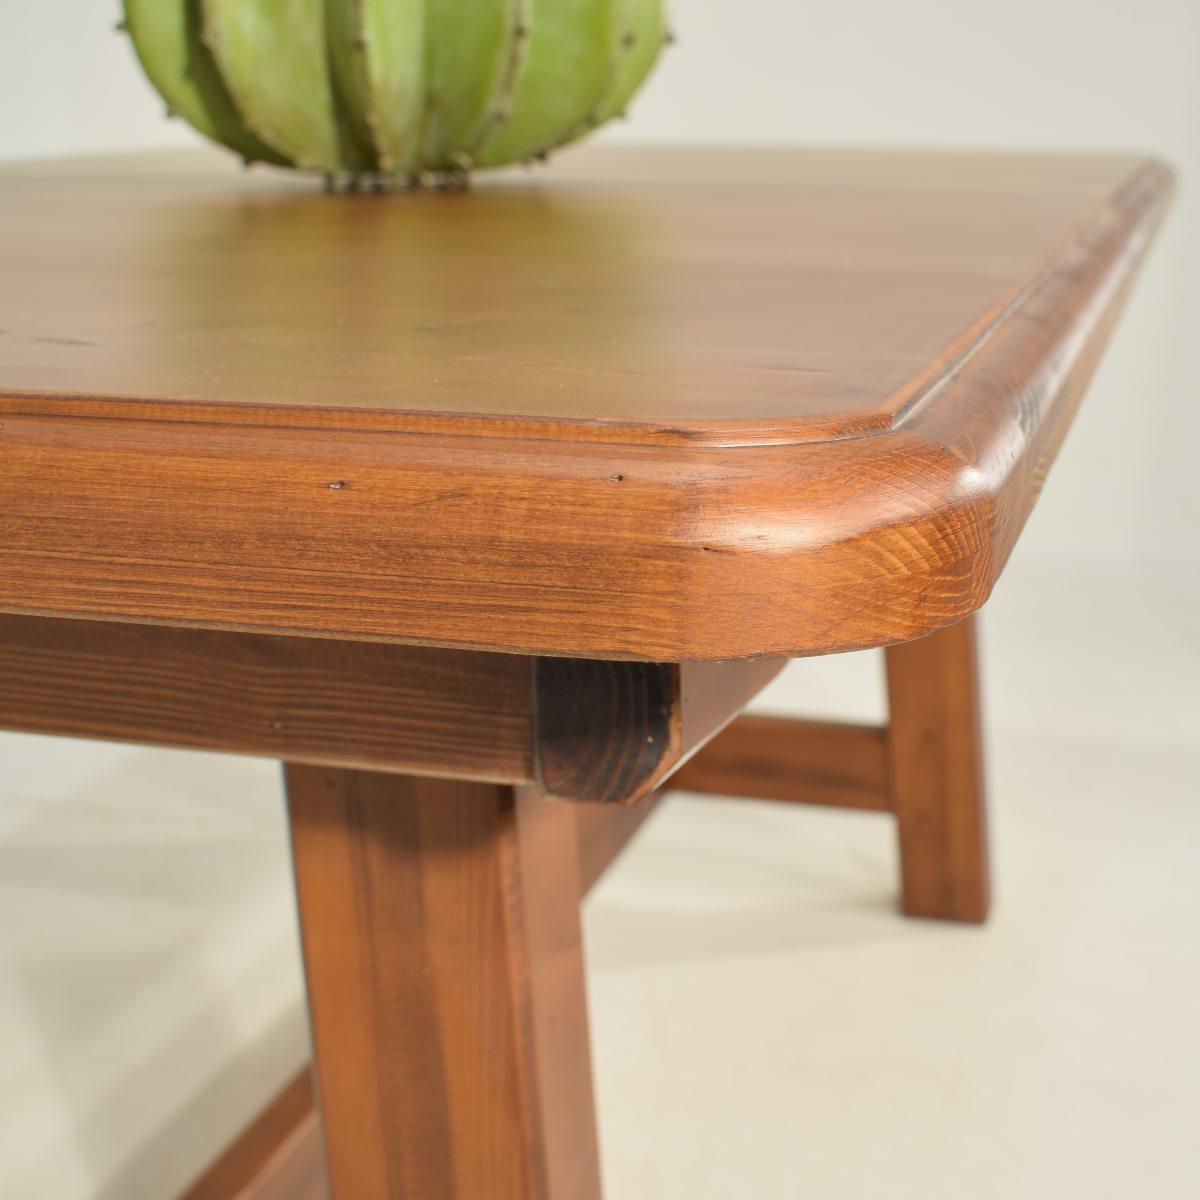 Mesa r stica 160 extensible ecor stico venta de muebles - Mesa auxiliar extensible ...